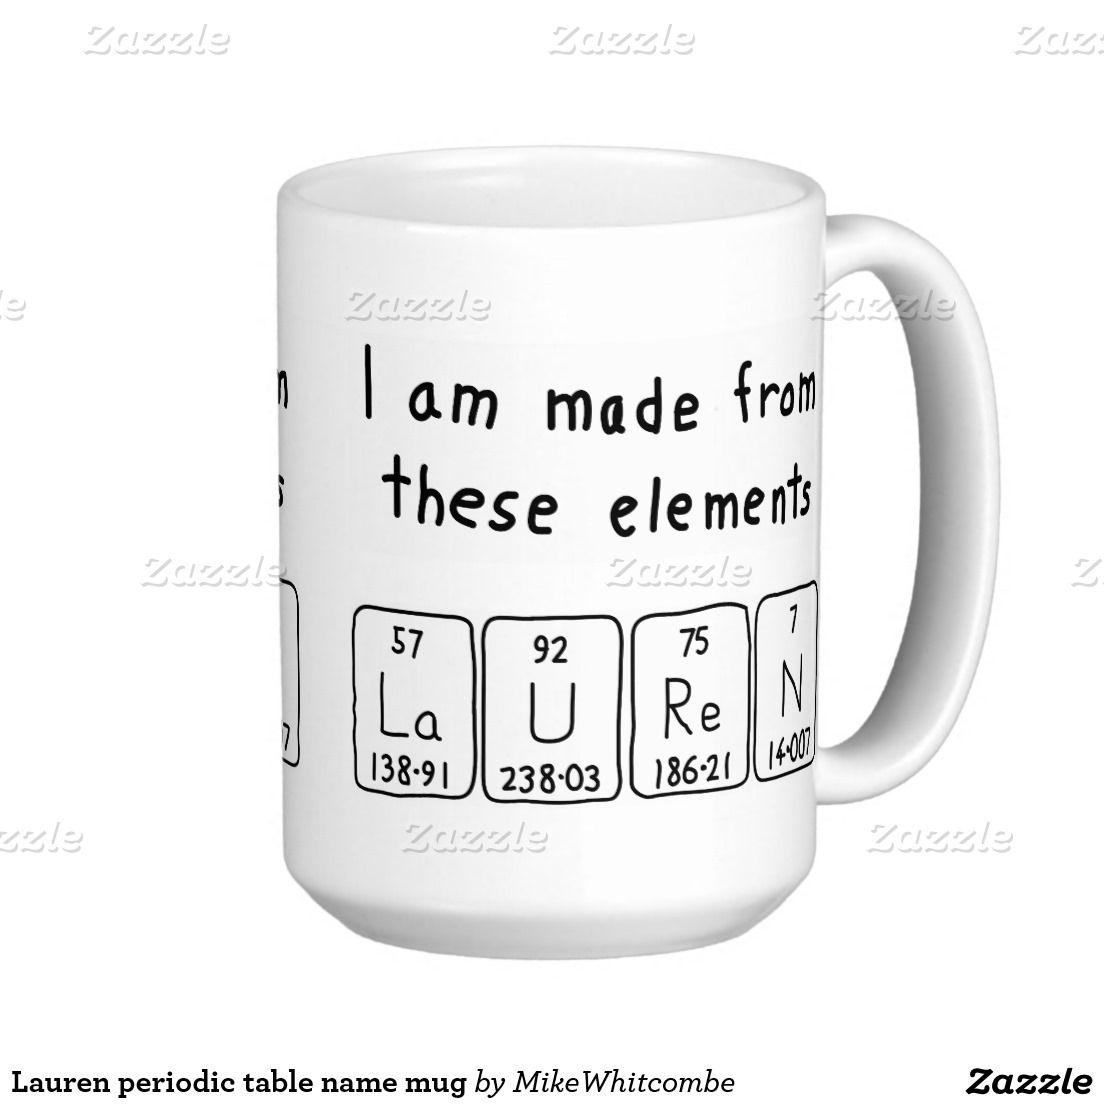 Lauren periodic table name mug periodic table lauren periodic table name mug urtaz Image collections